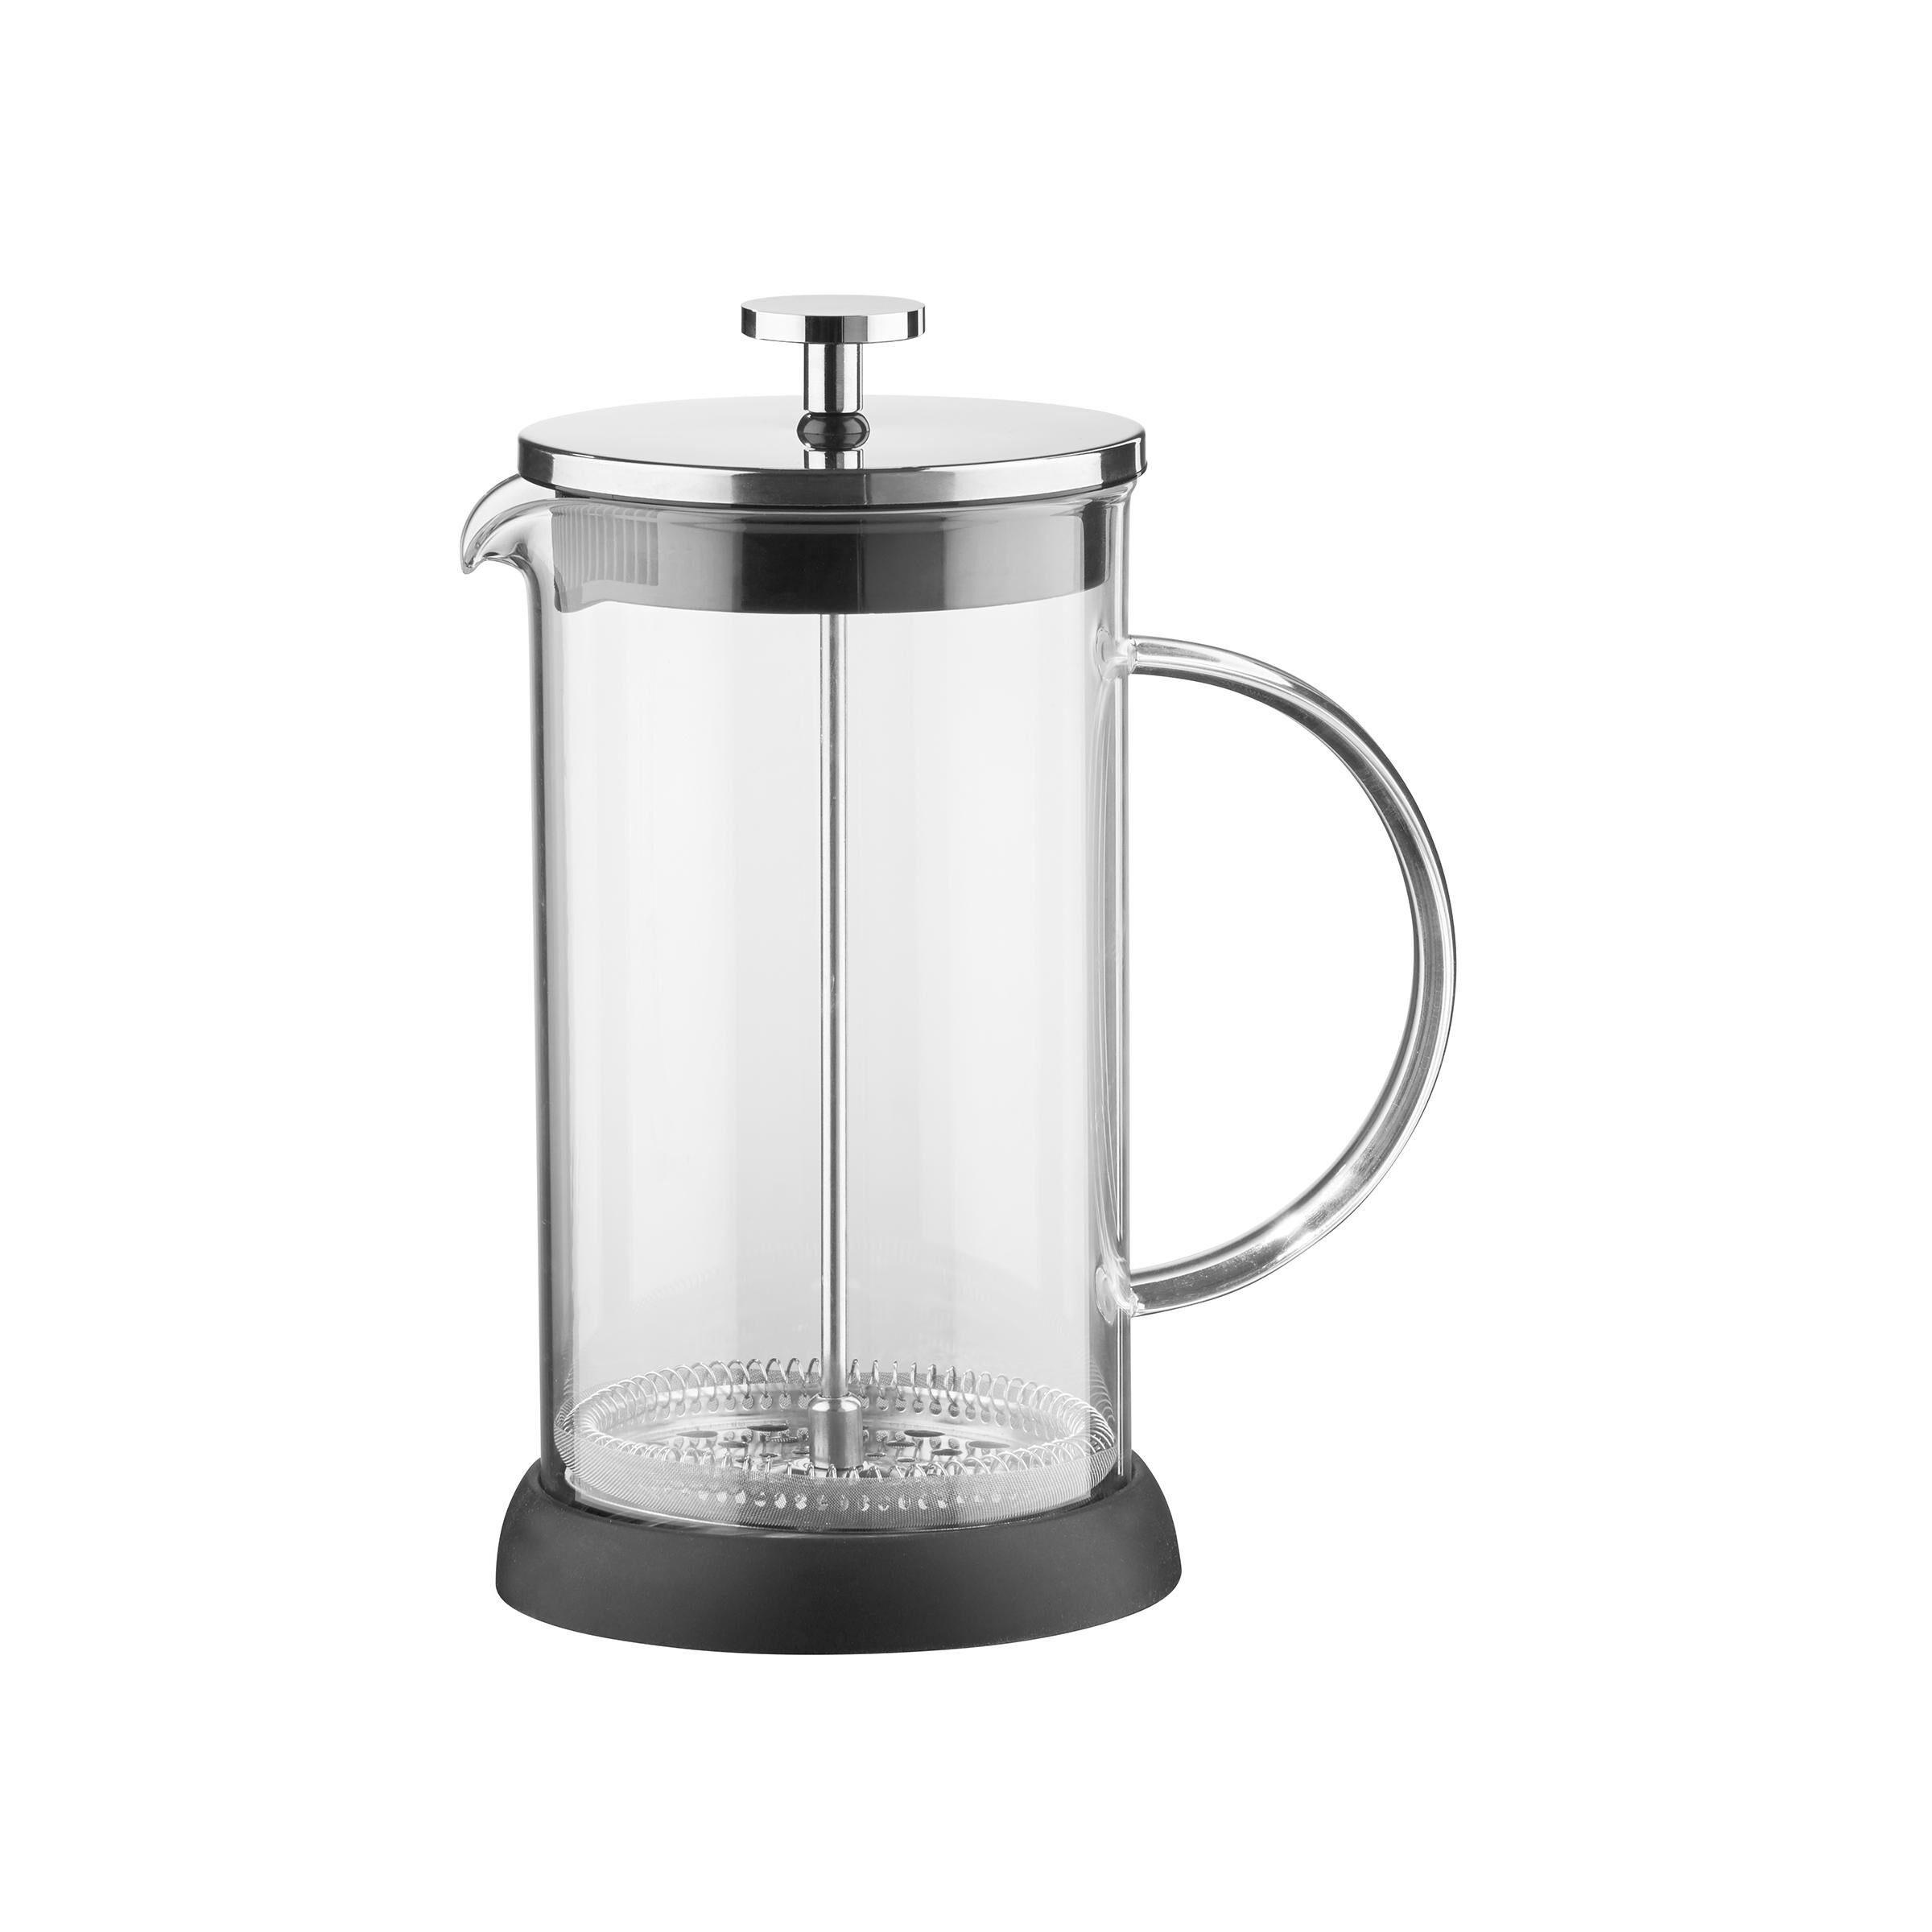 WMF Coffee Time French Press Kaffeekanne 0,75 l.Glaskanne 2 Kaffeetassen